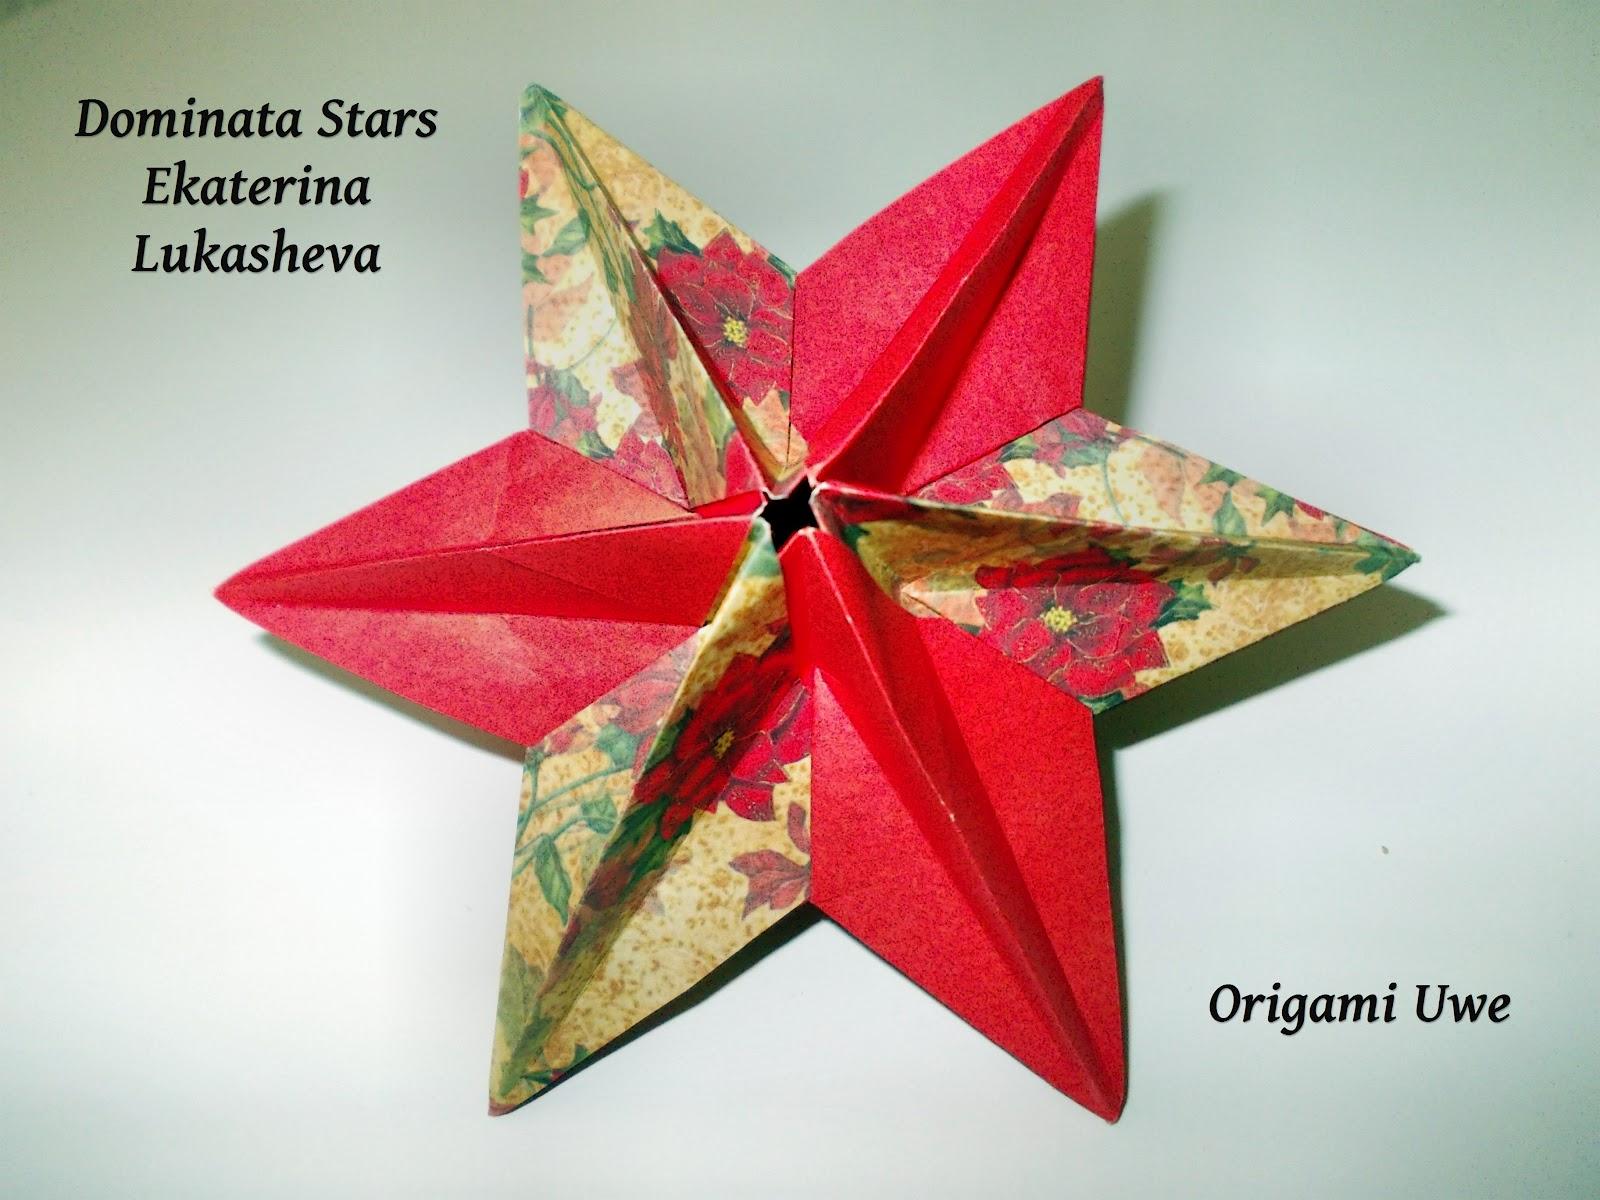 origami fleurogami und sterne kleiner dominanta stern by ur fleurogami. Black Bedroom Furniture Sets. Home Design Ideas